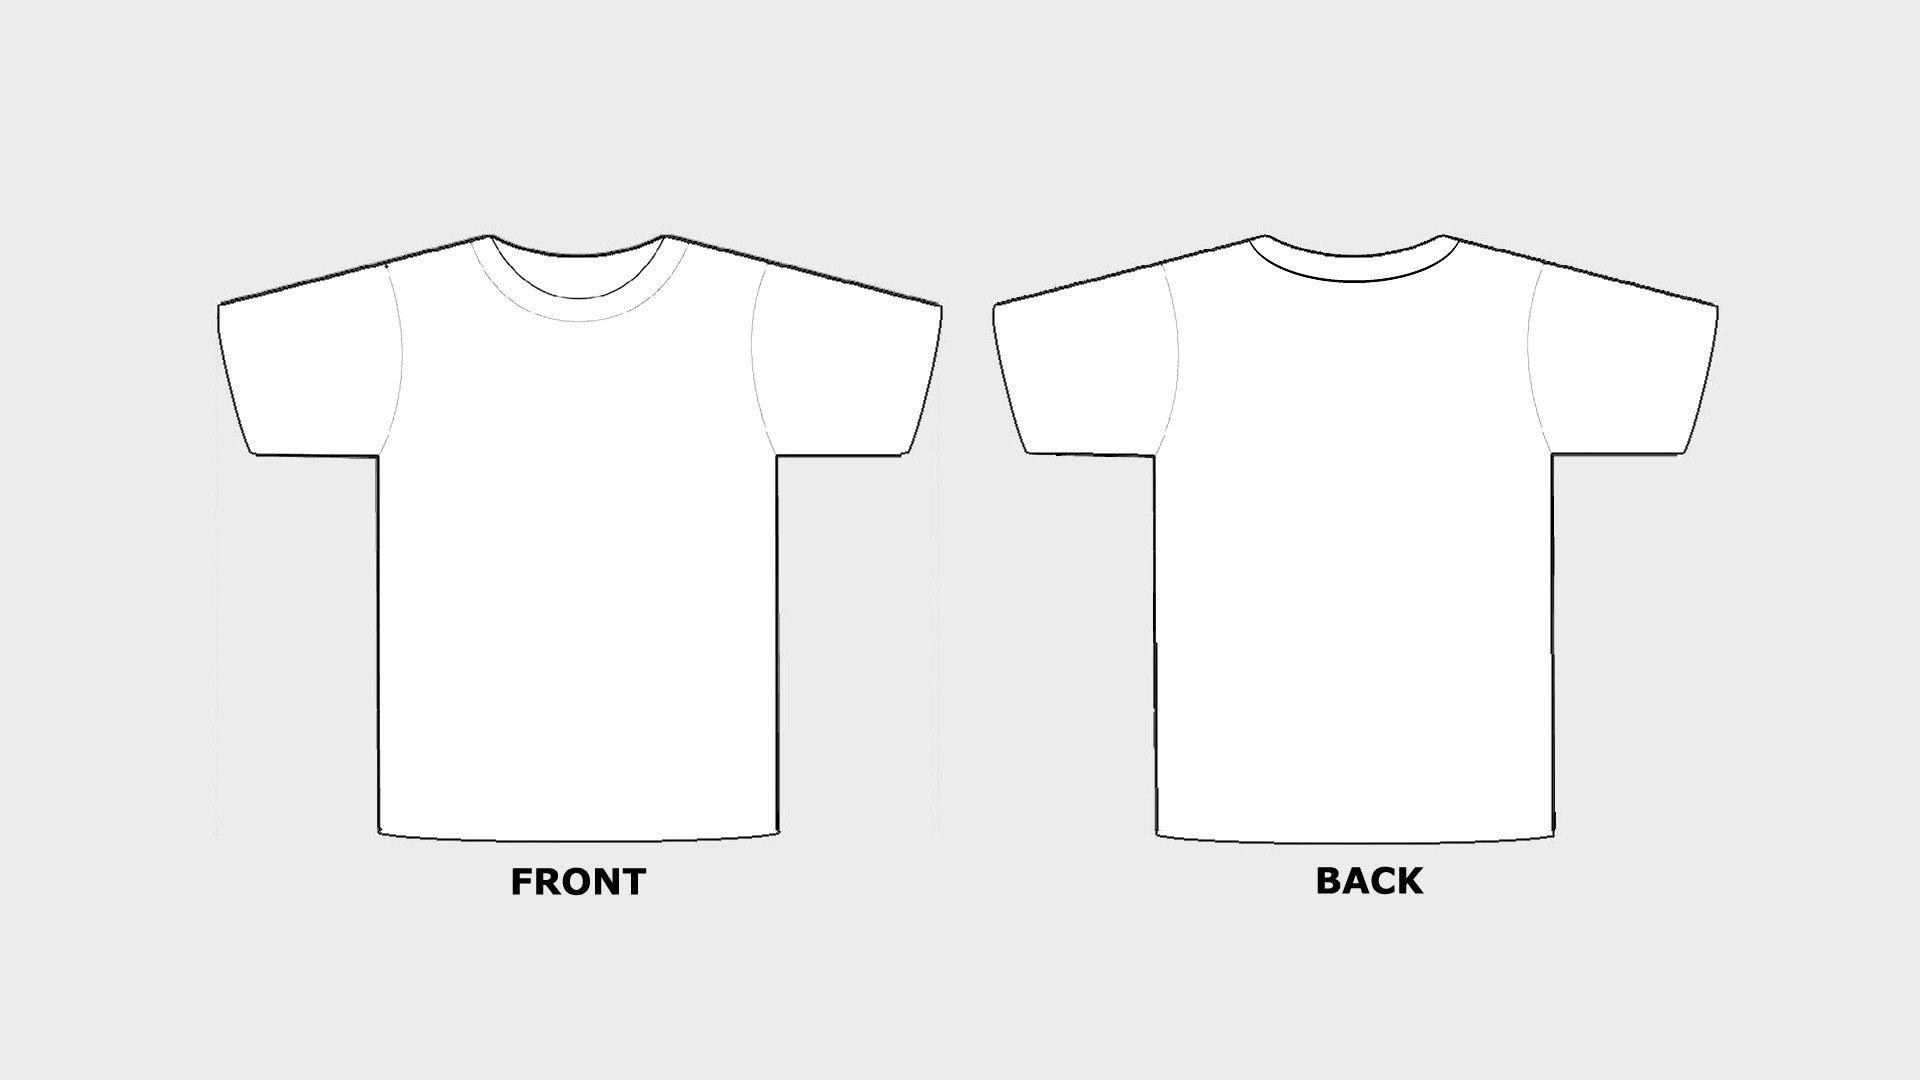 Tee Shirt Design Template Blank Tshirt Template Printable In Hd Hd Wallpapers